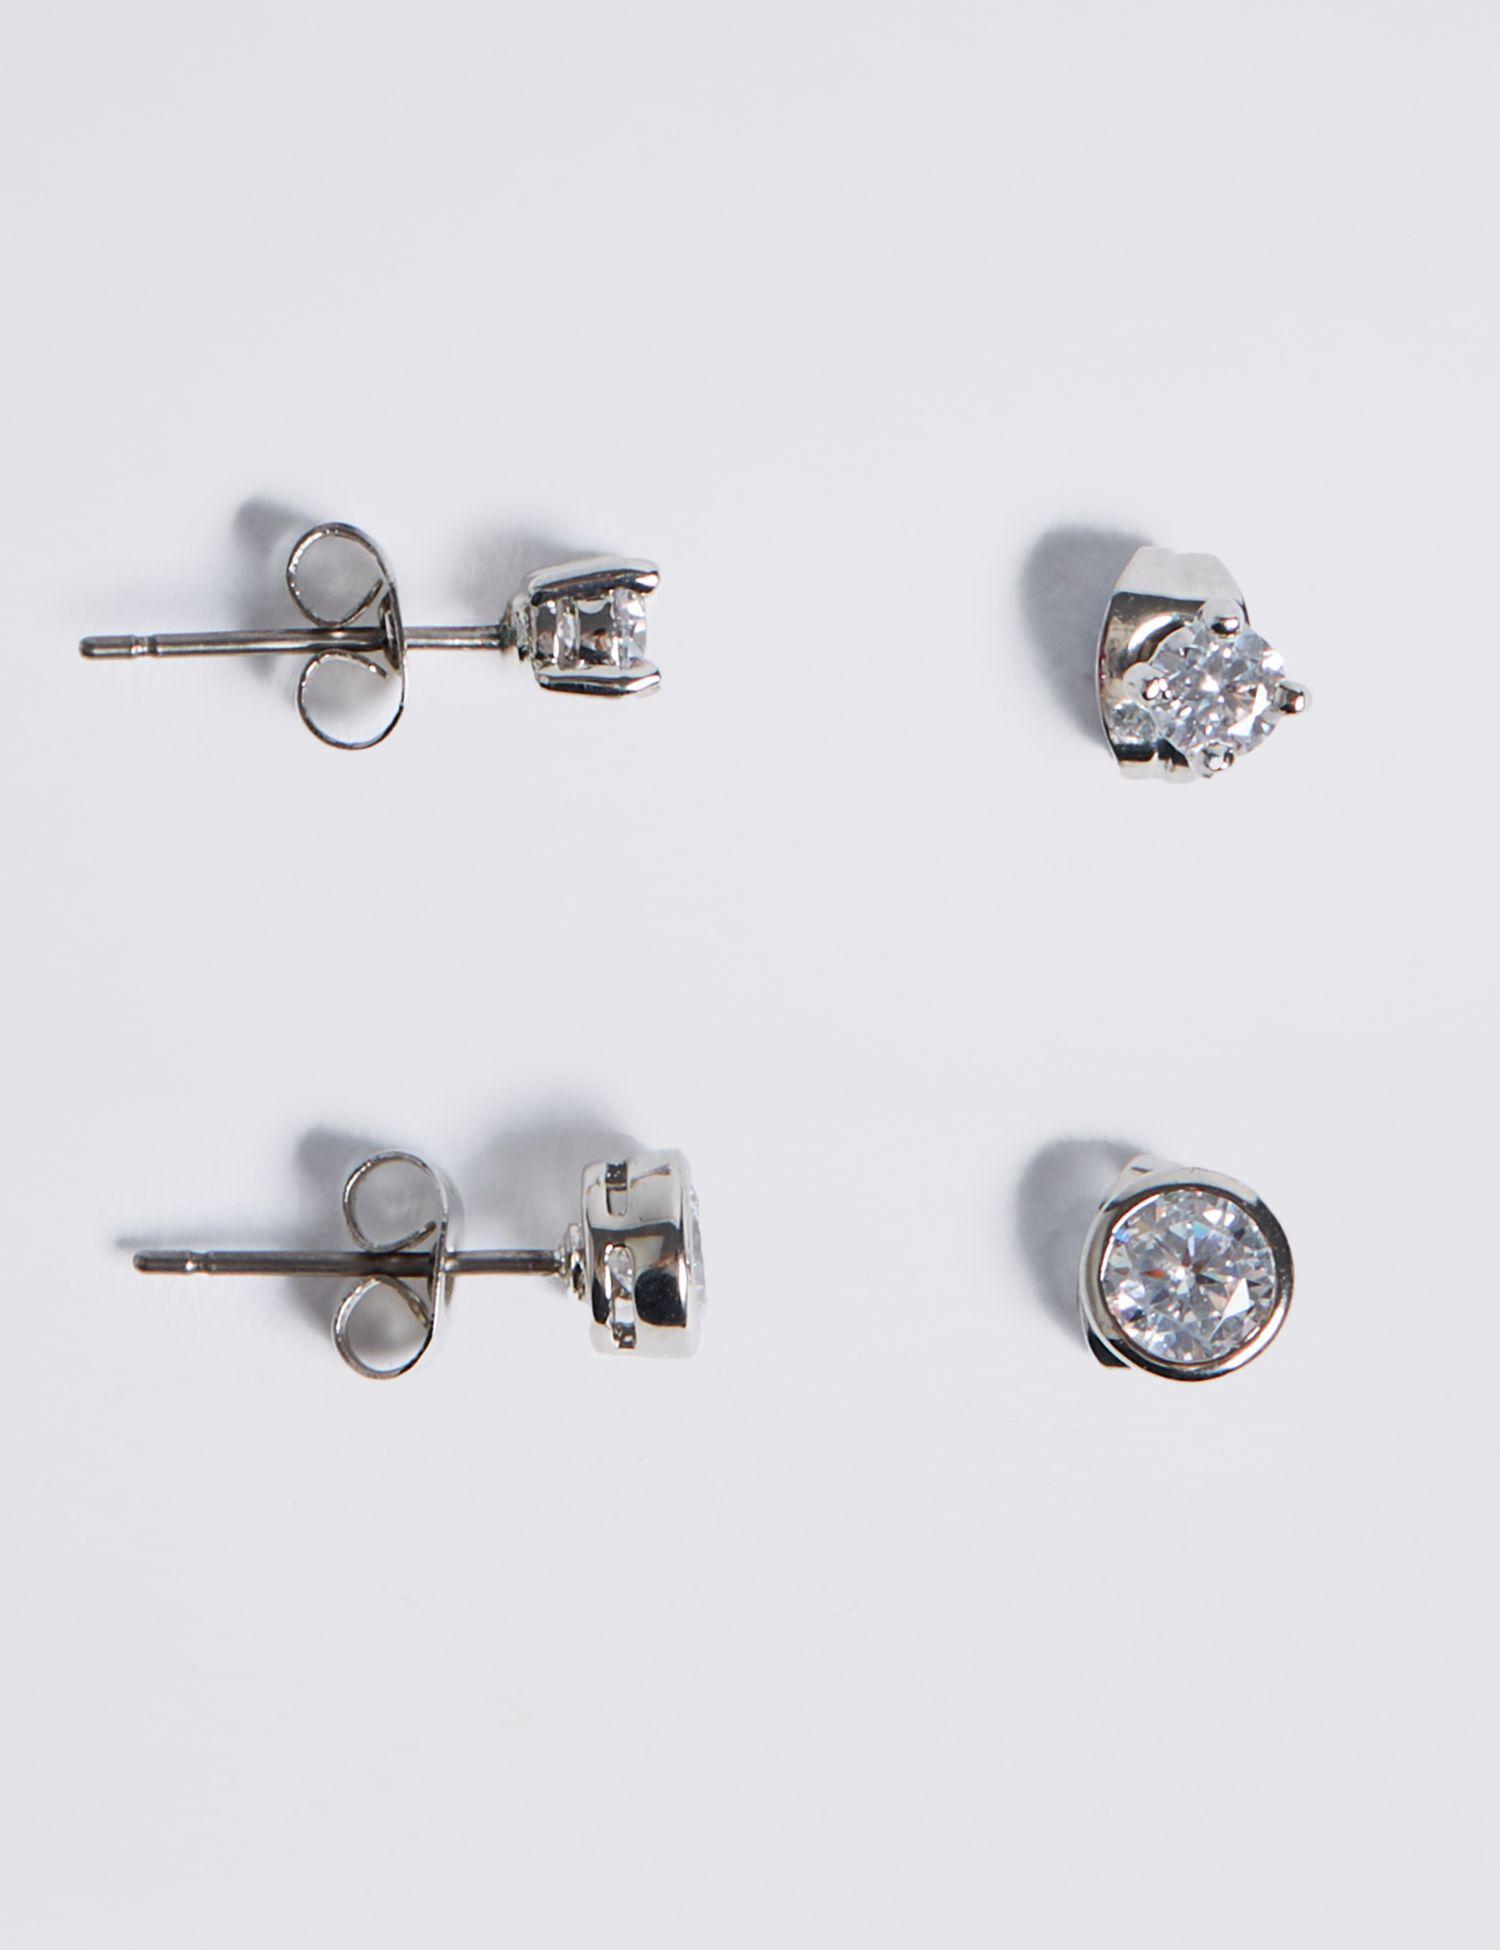 9f004249c Marks & Spencer Platinum Plated Diamanté Stud Earrings Set in ...